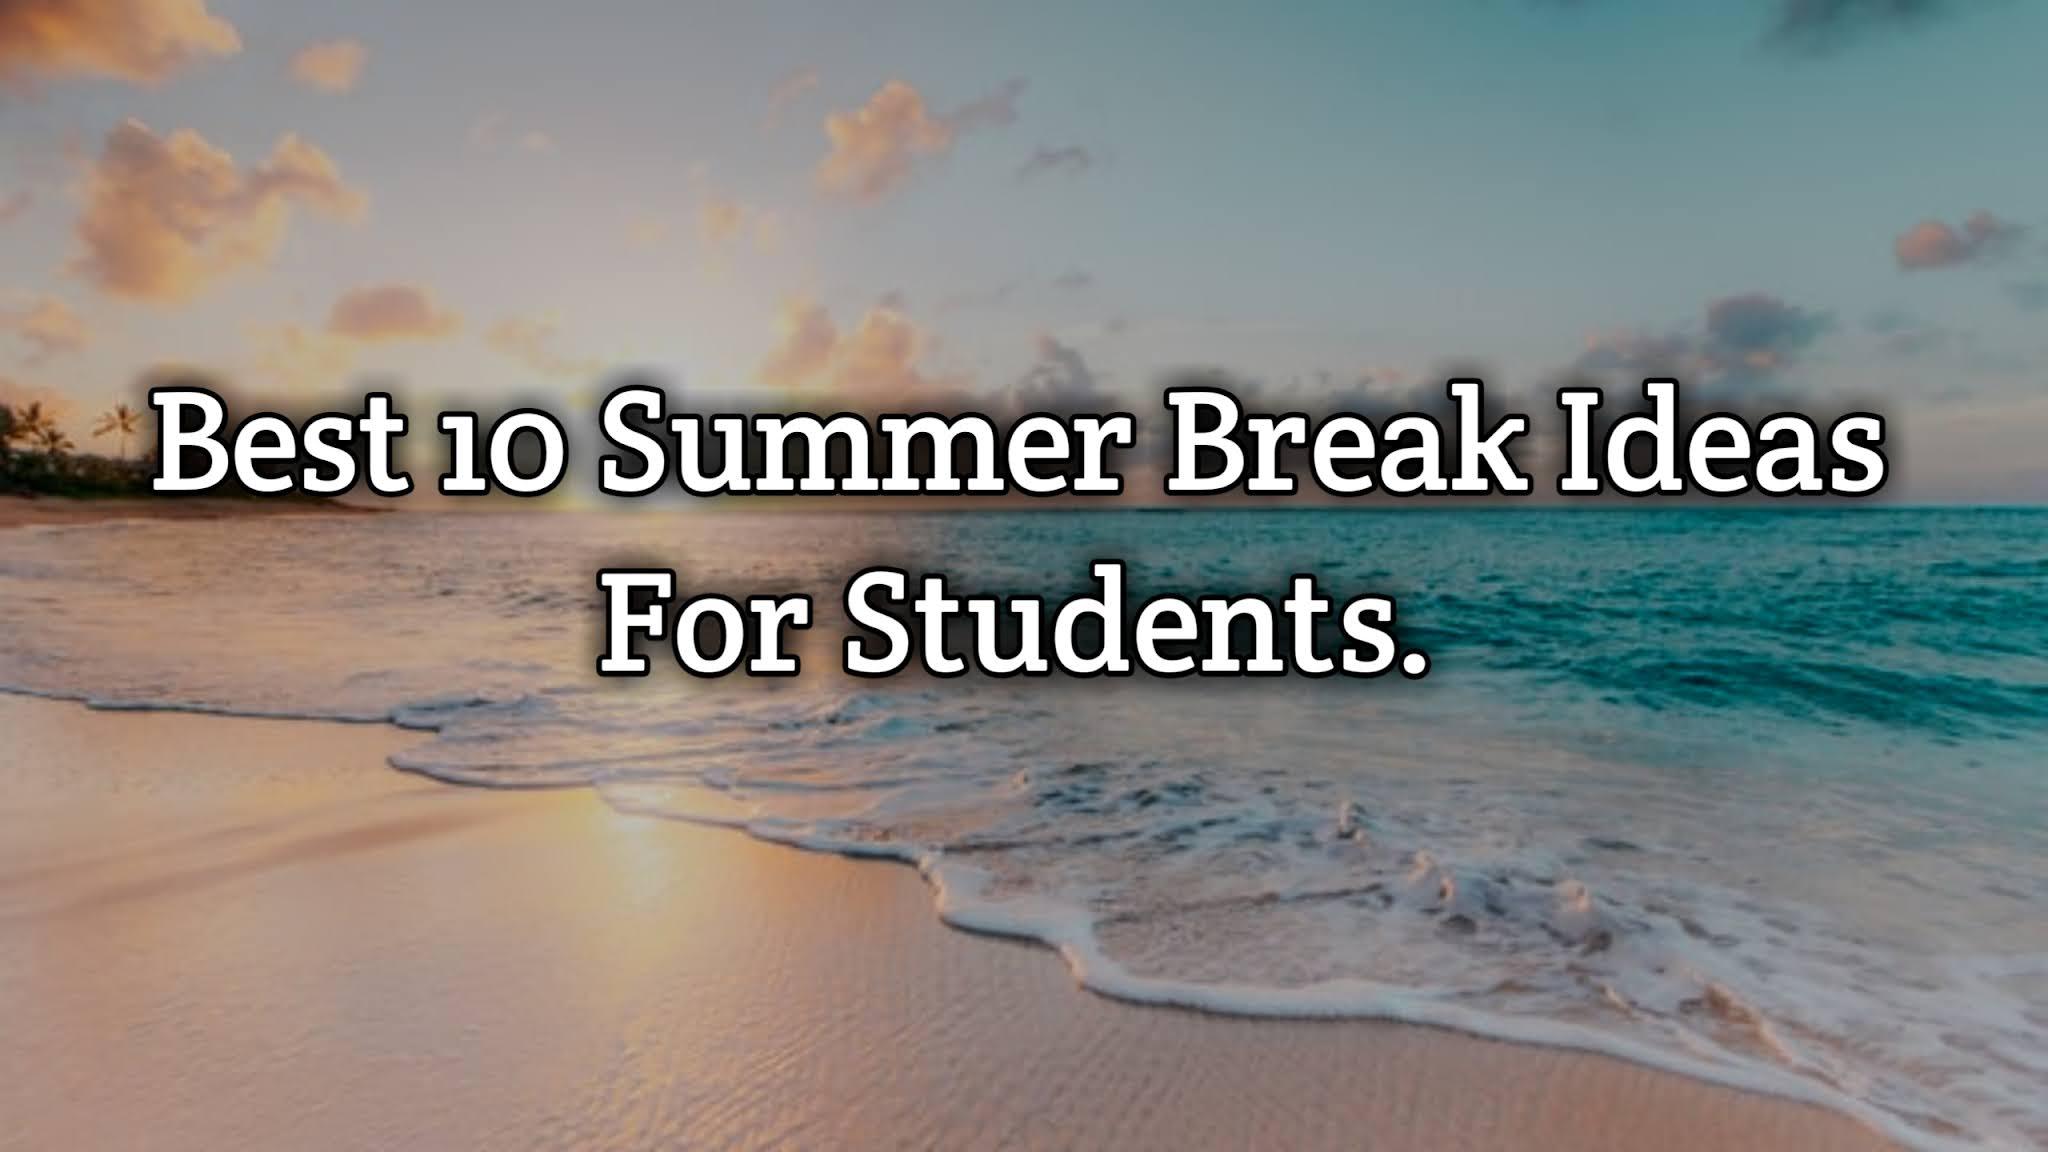 Best 10 Summer Break Ideas For Students.